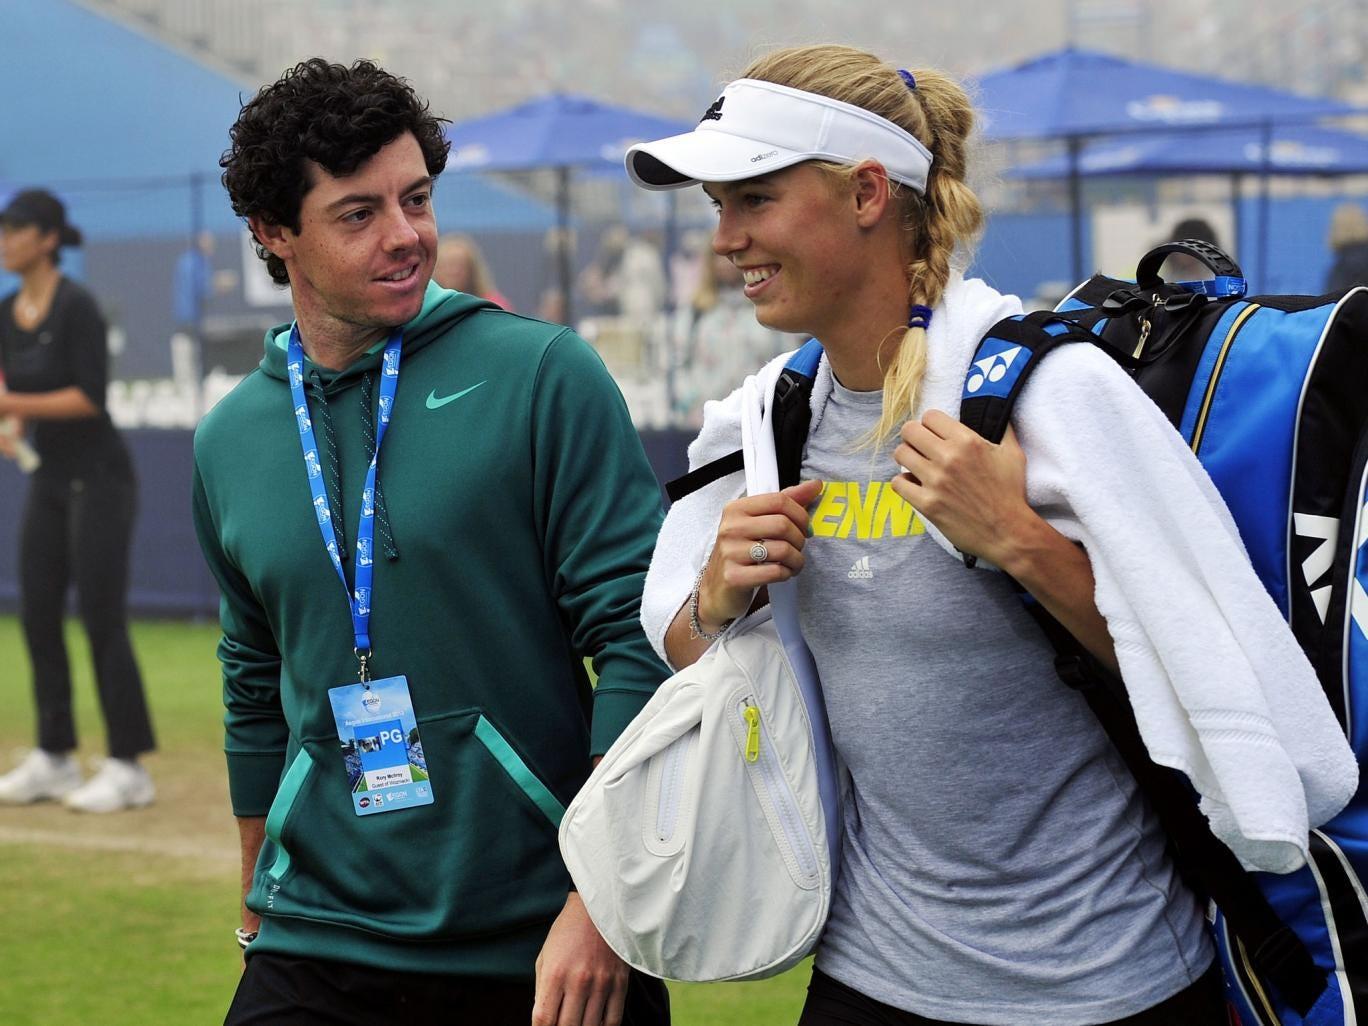 Rory McIlroy broke off his engagement to Caroline Wozniacki on Wednesday